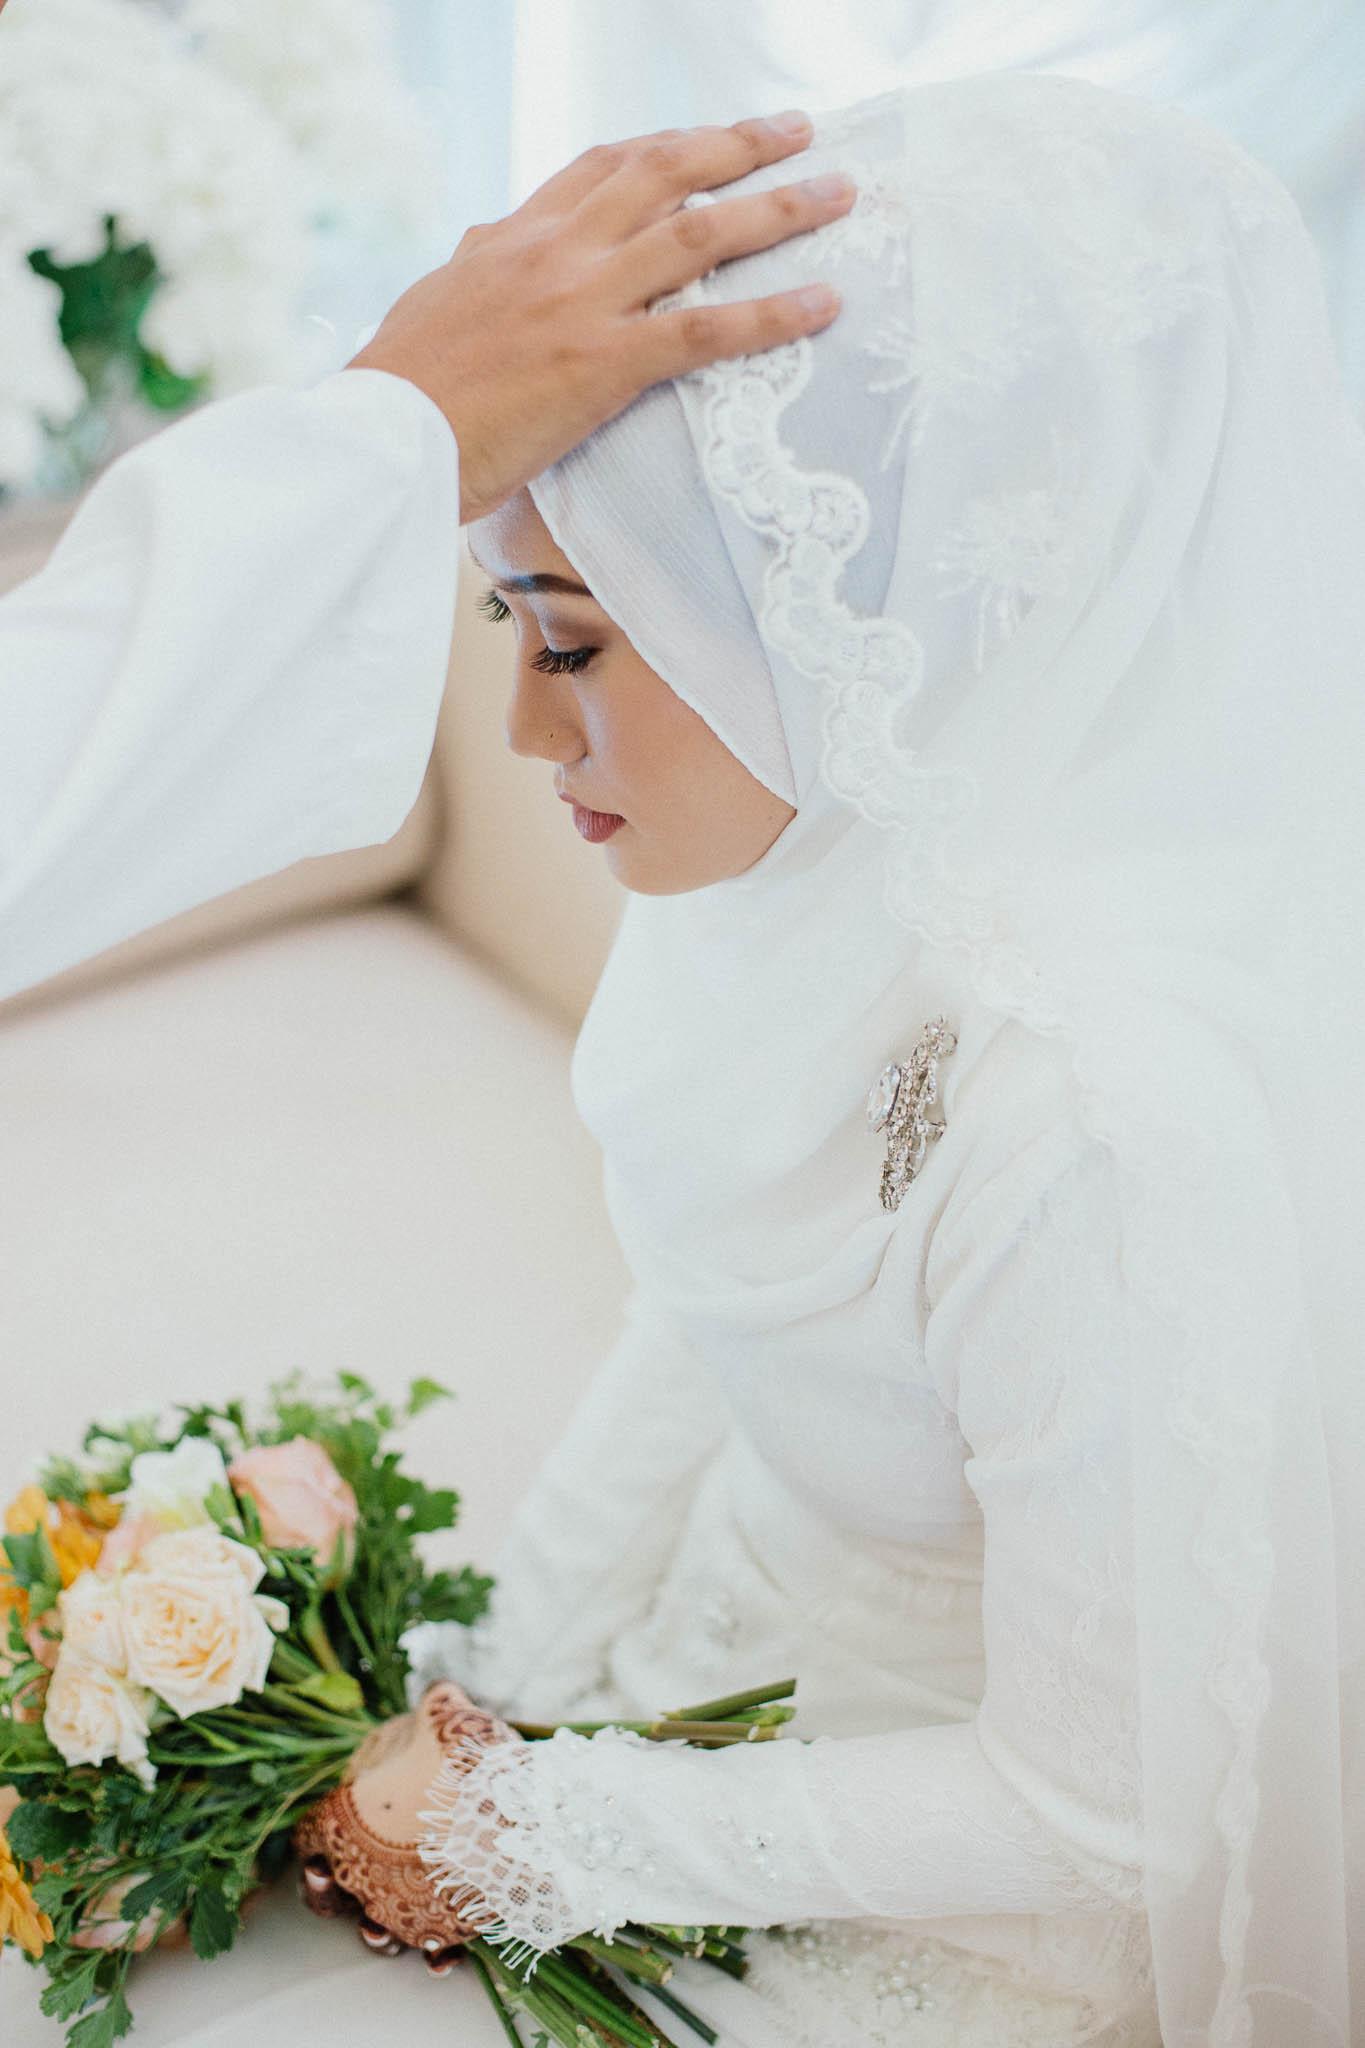 singapore-wedding-photographer-wedding-nufail-addafiq-025.jpg